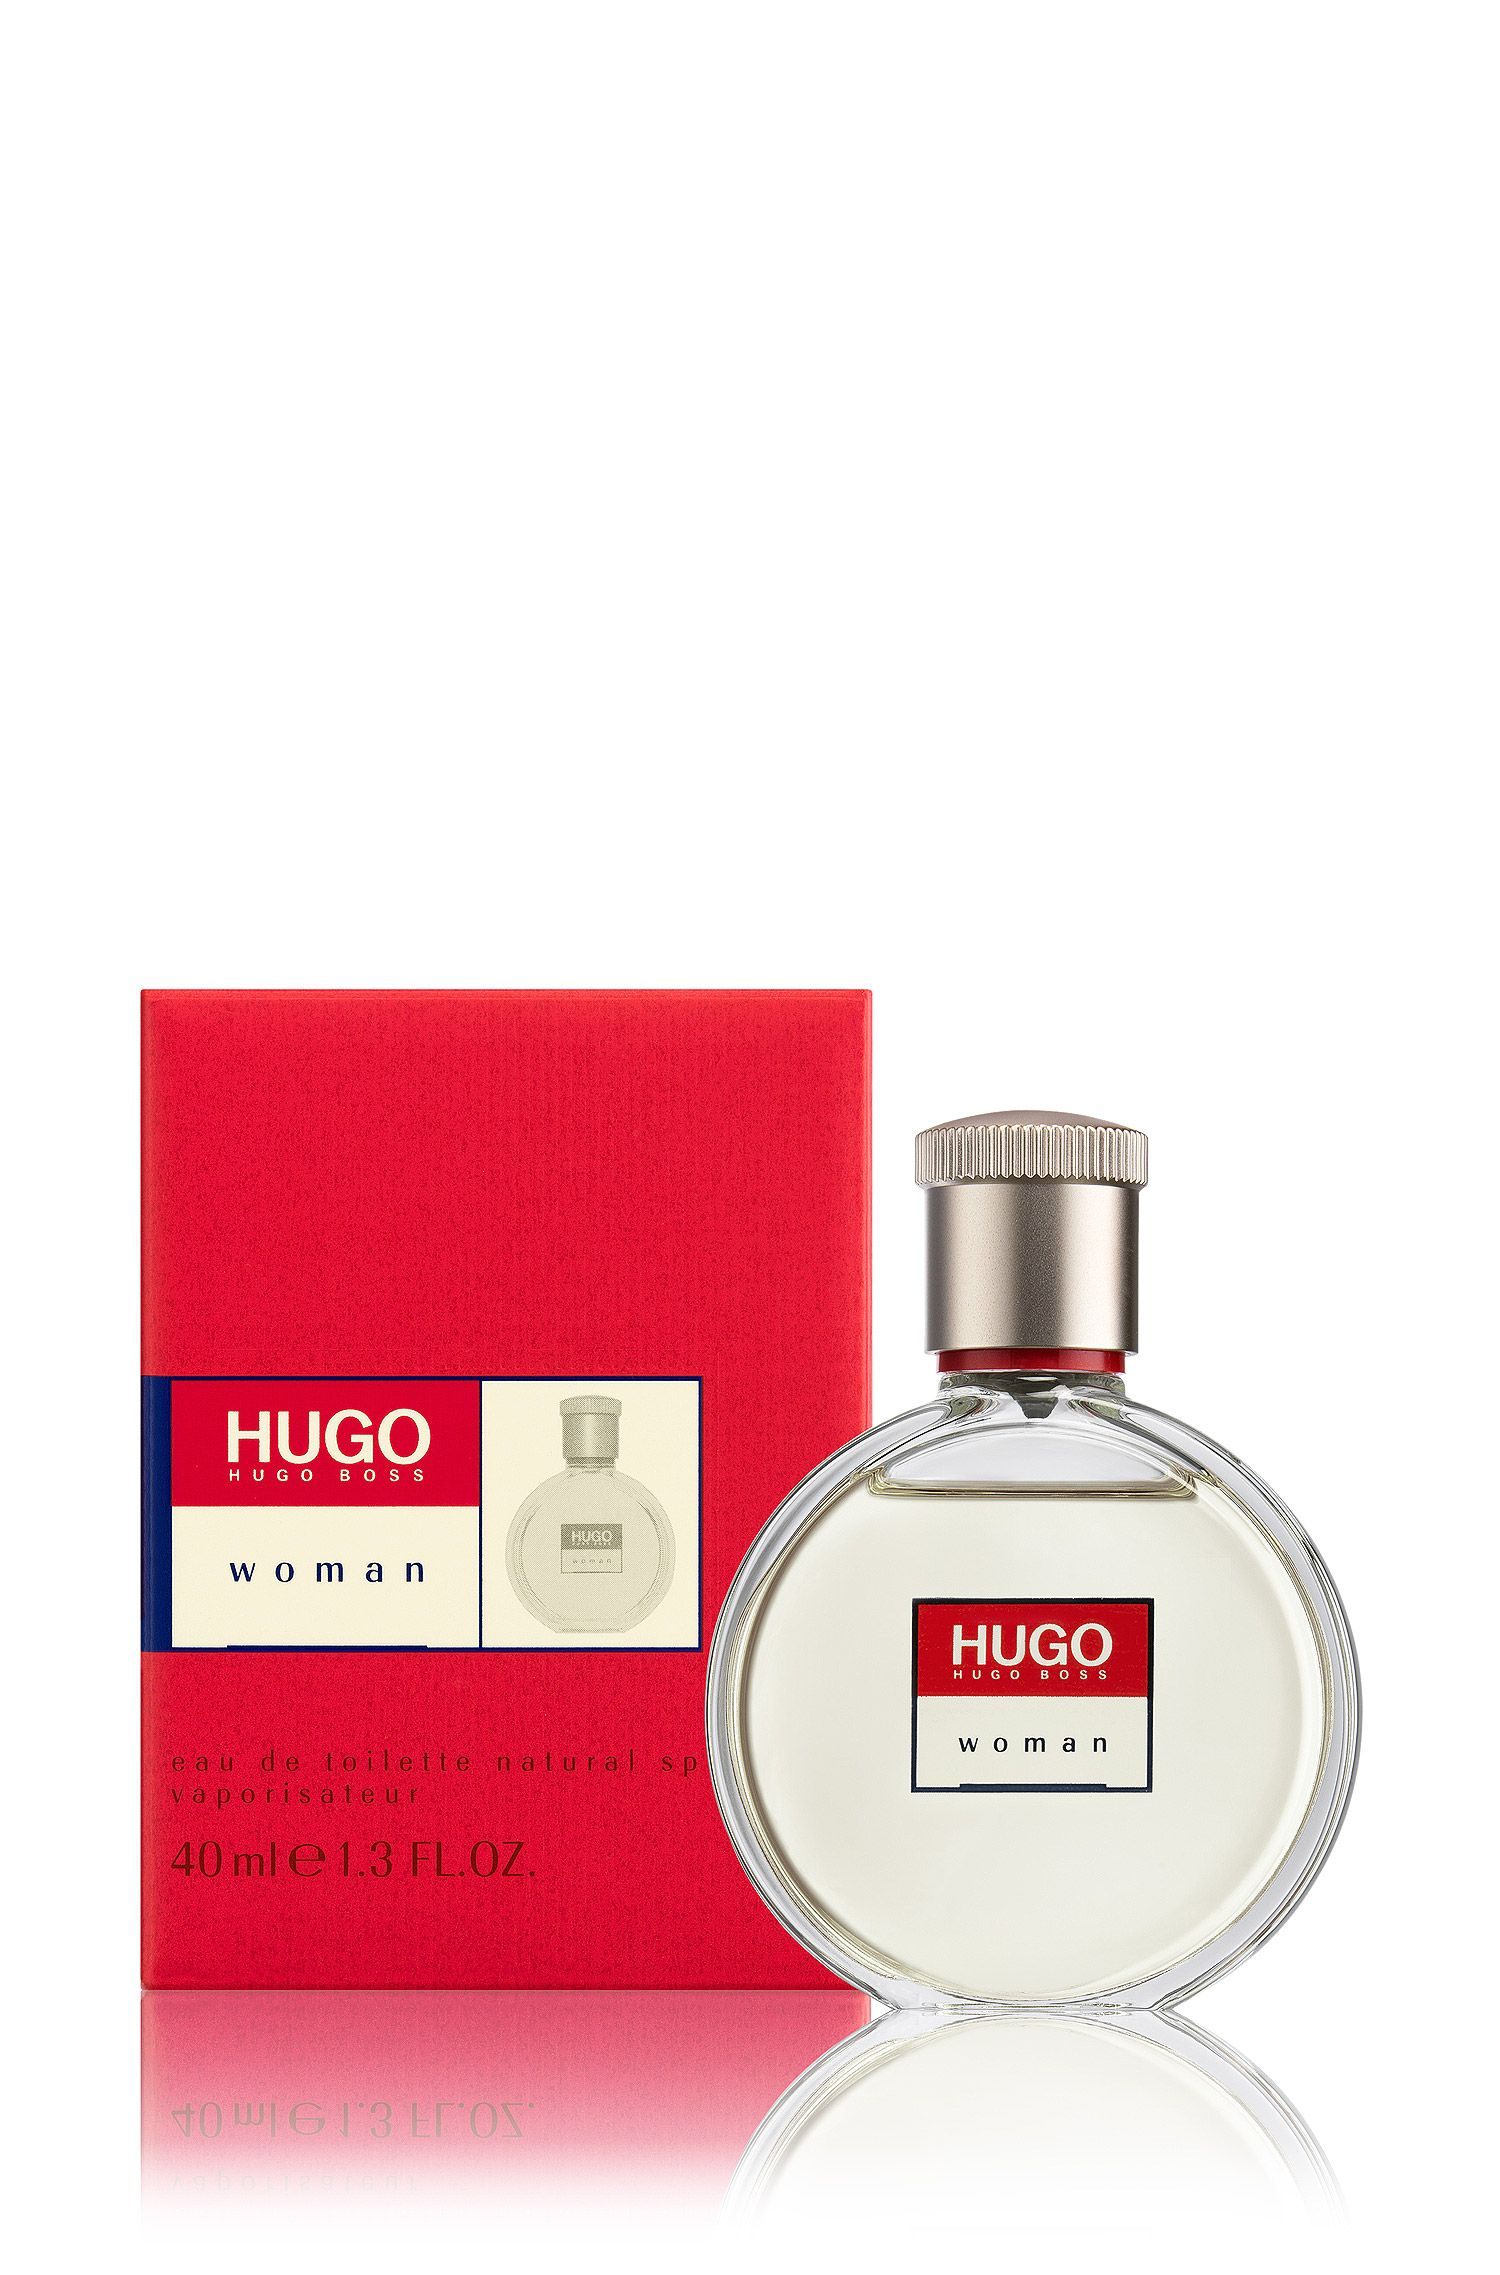 HUGO Woman Eau de Toilette 40 ml